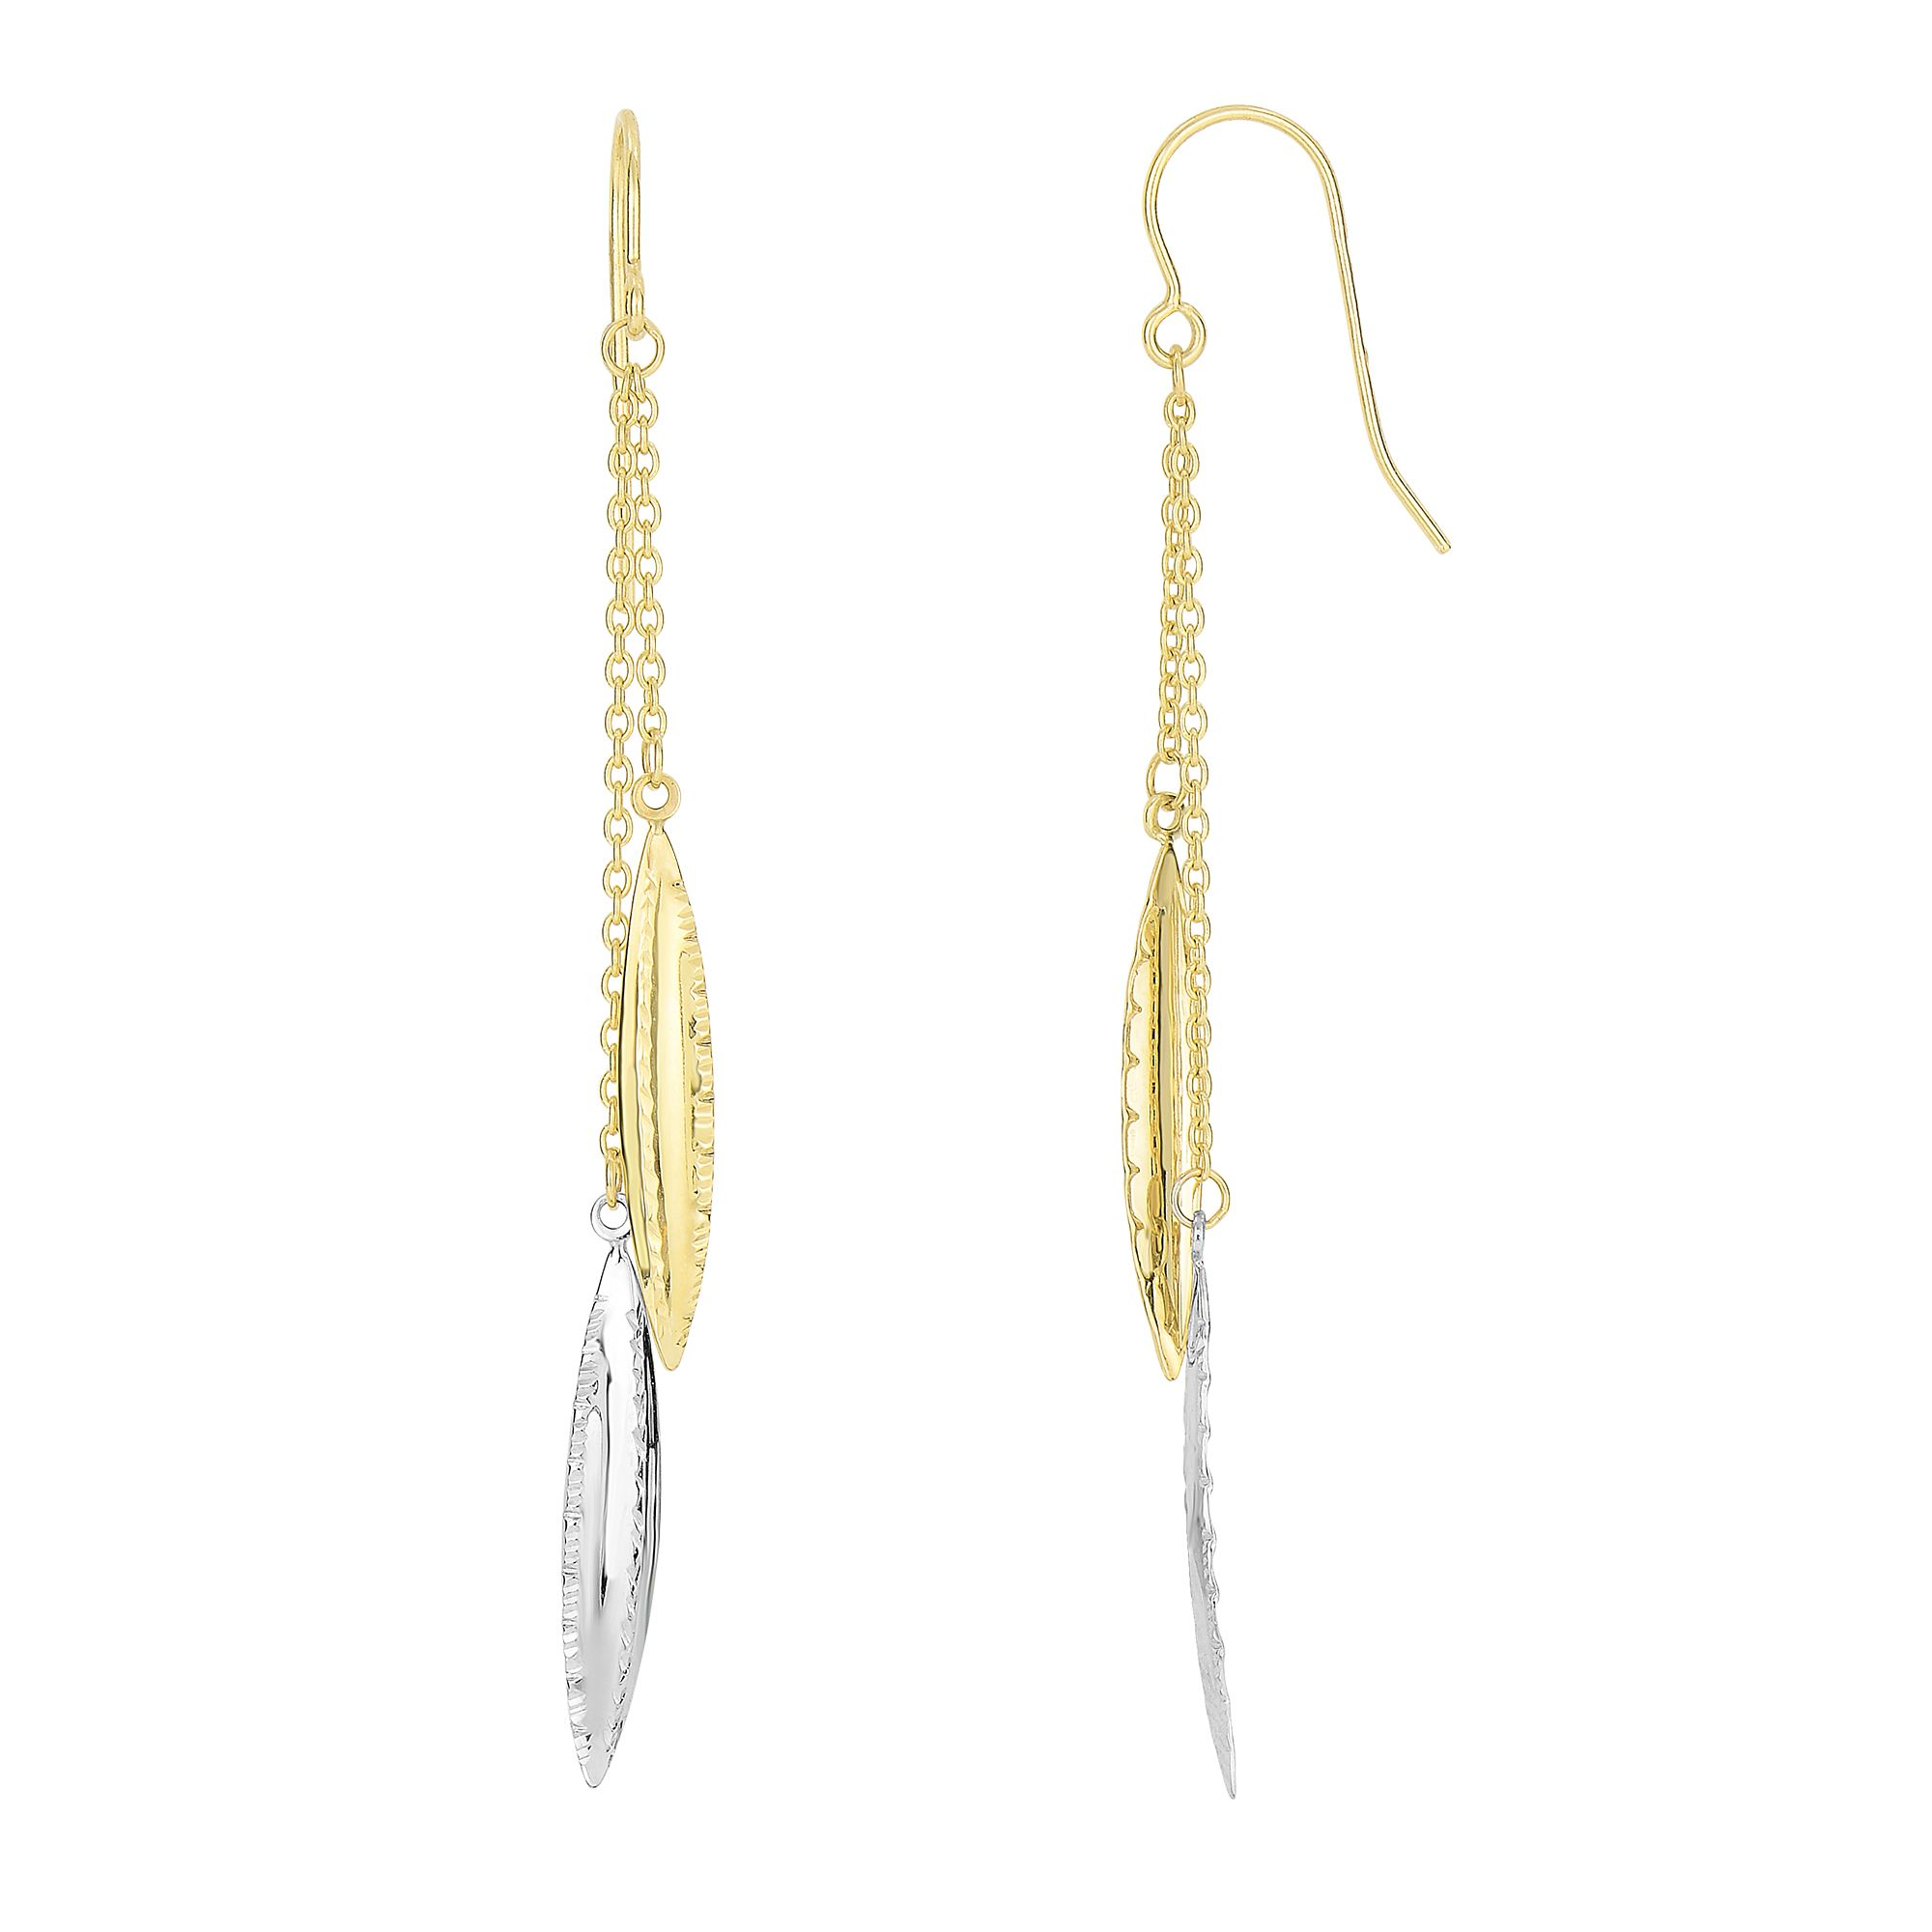 14 Karat Gold Two Tone Leaf Design Dangling Earrings